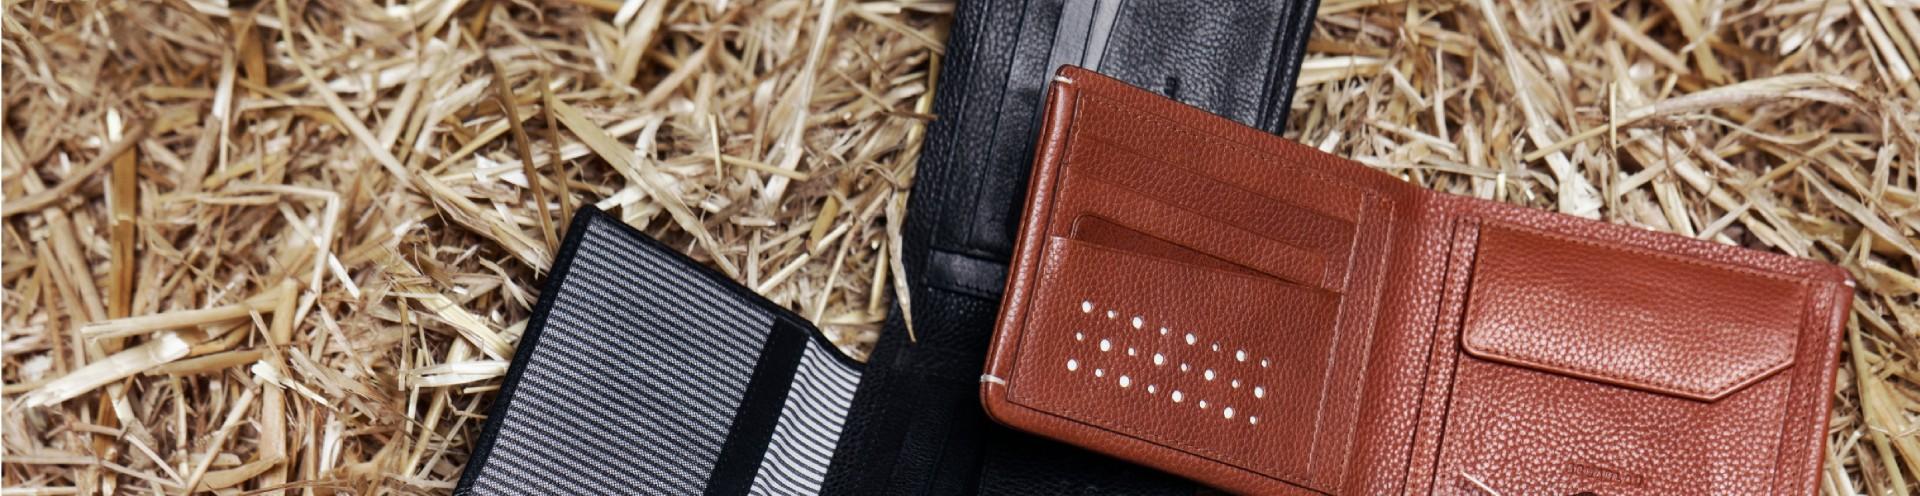 Men's Leather RFID Wallets